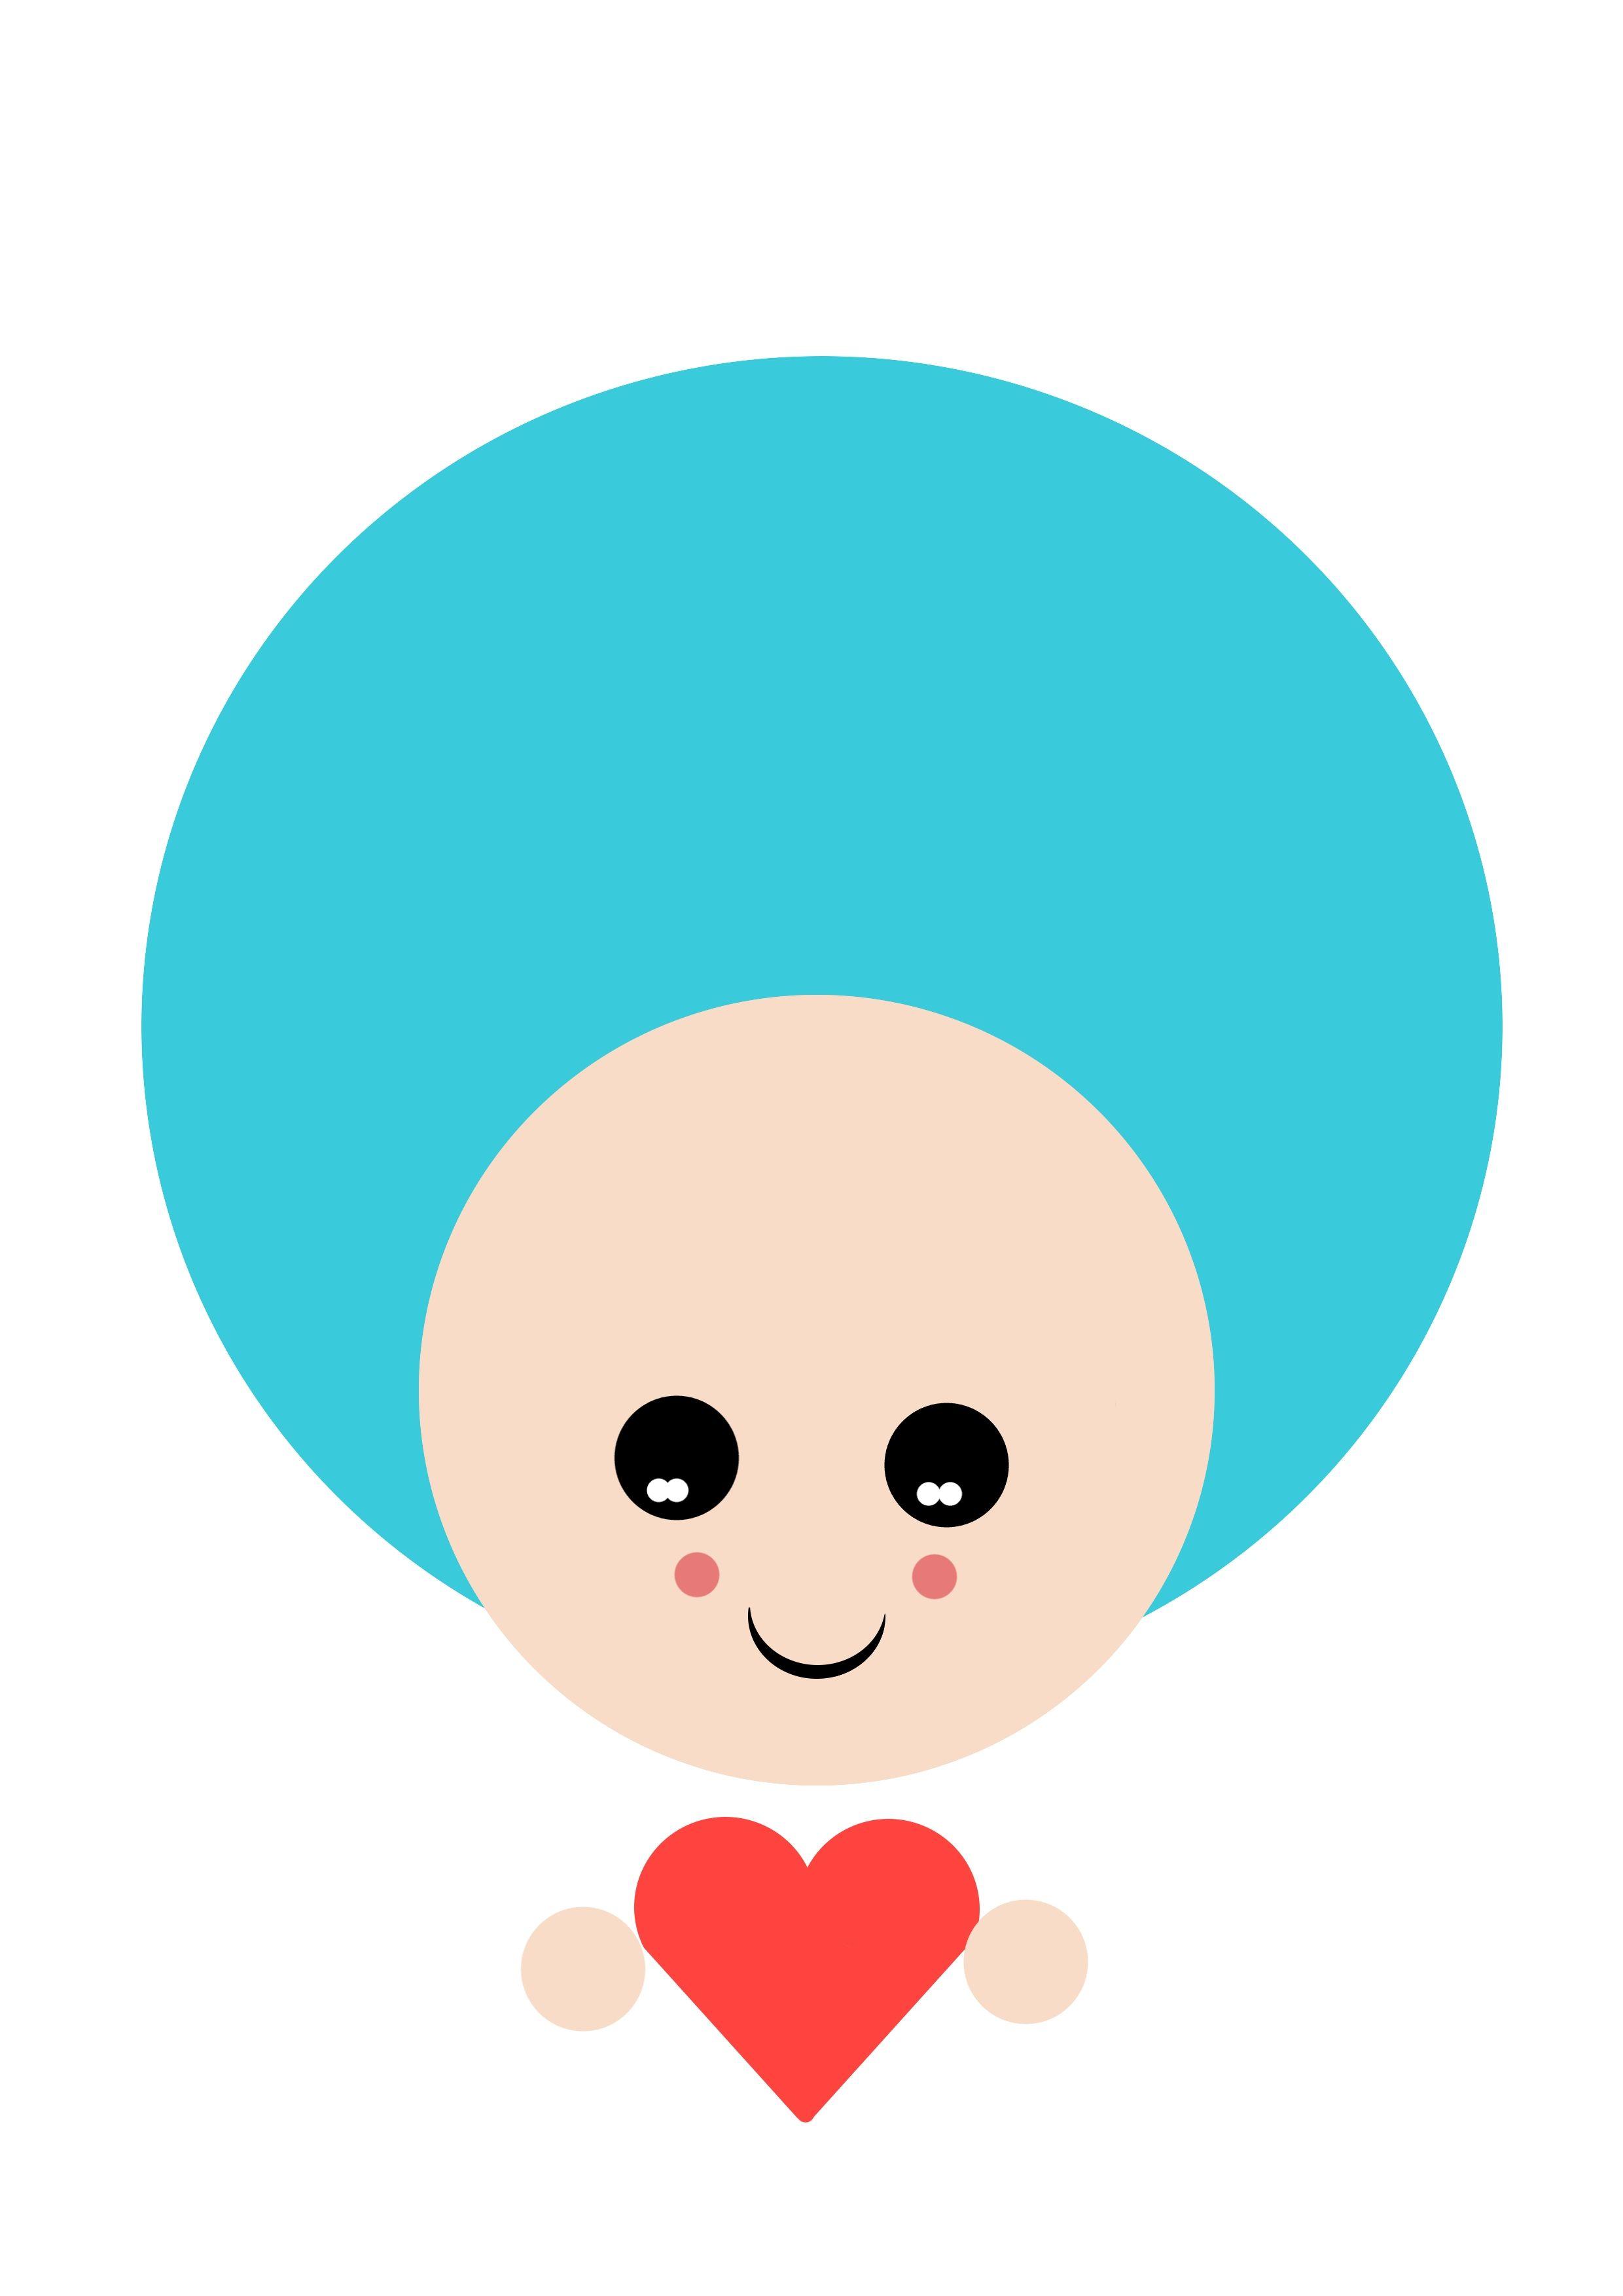 LoveBoys #Amor #Tierno #GIMP #DibujoDigital